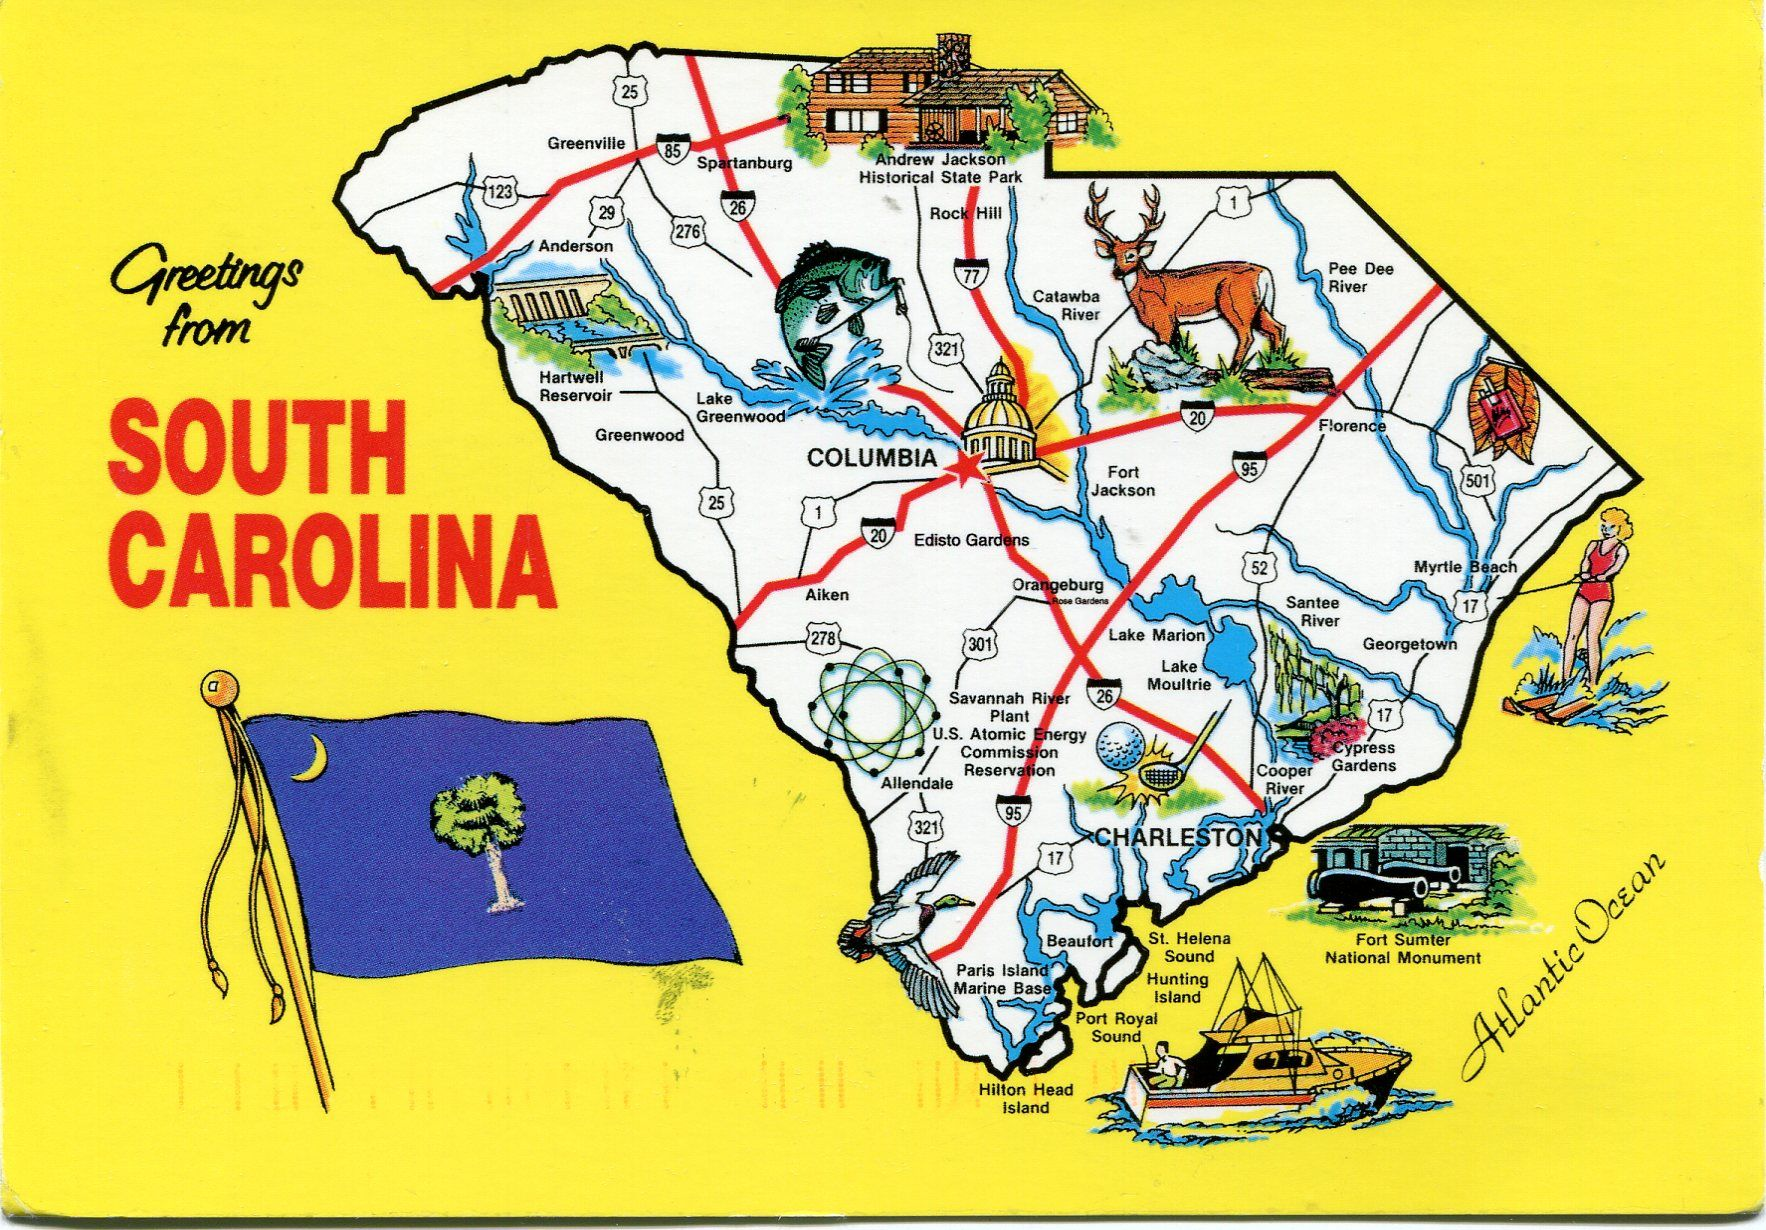 South Carolina Map South Carolina State Map Garden City South Carolina